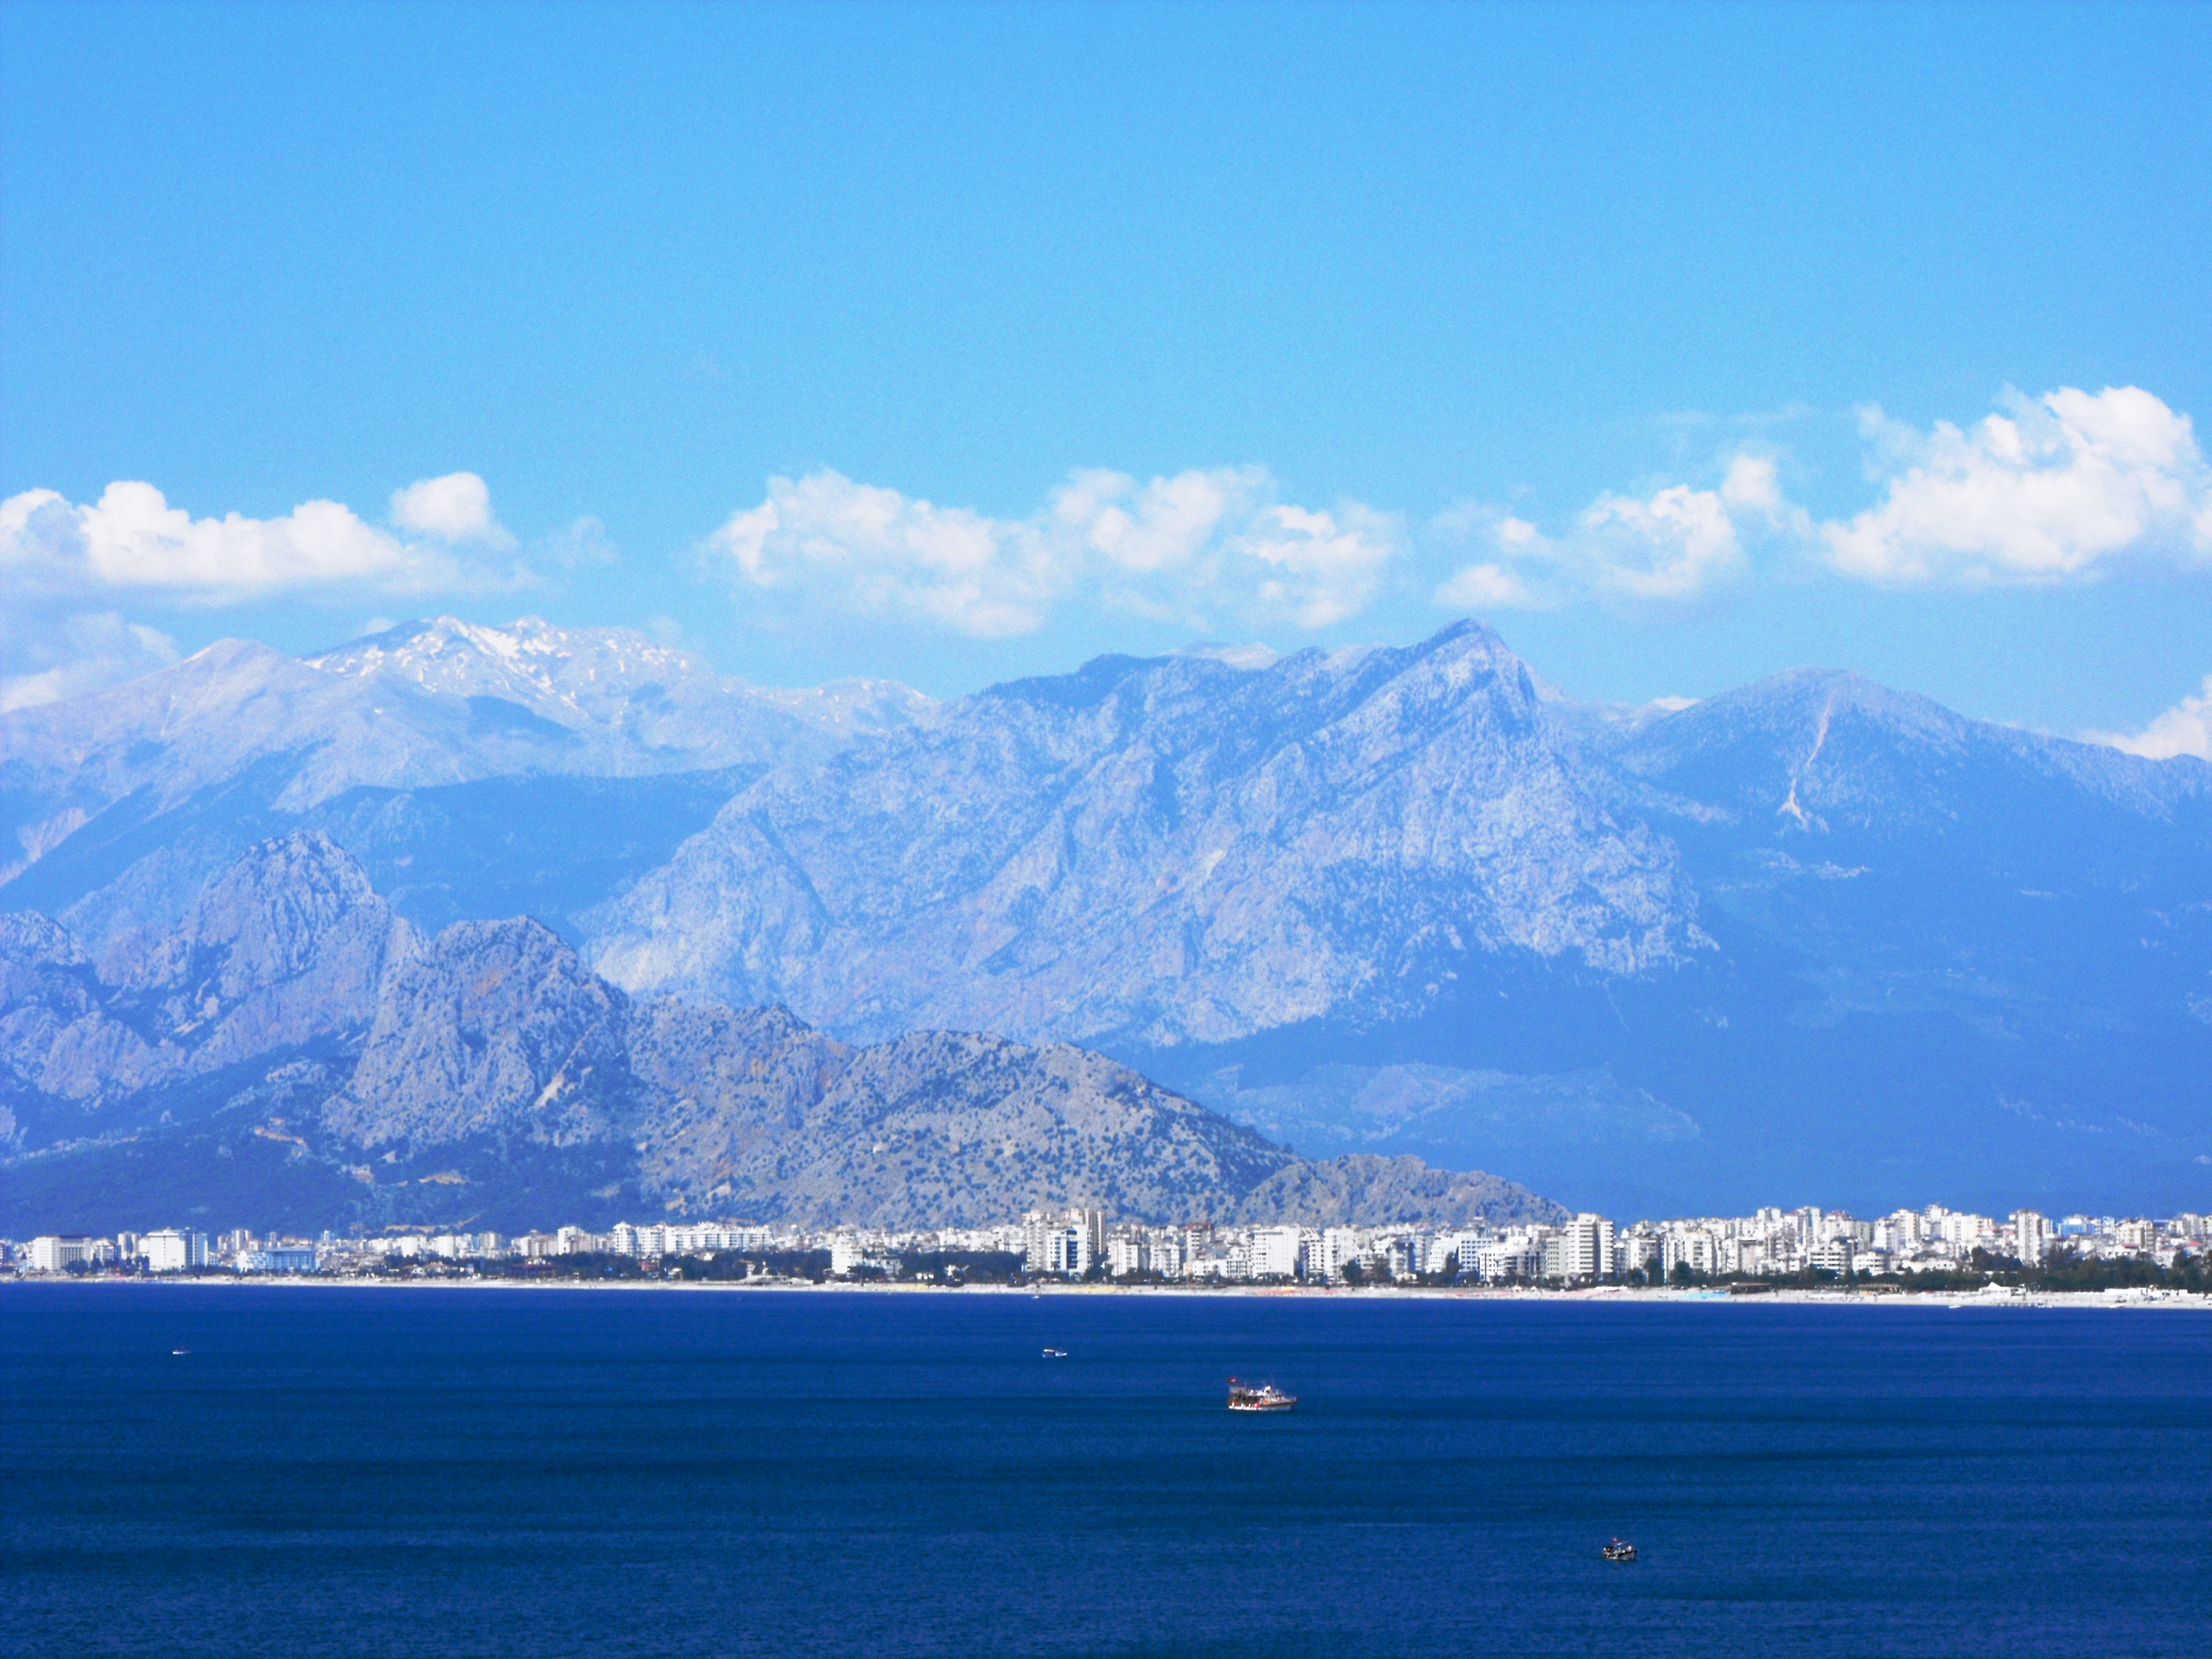 Antalya and the Taurus mountains, Antalya, Landscape, Mediterranean, Mountains, HQ Photo